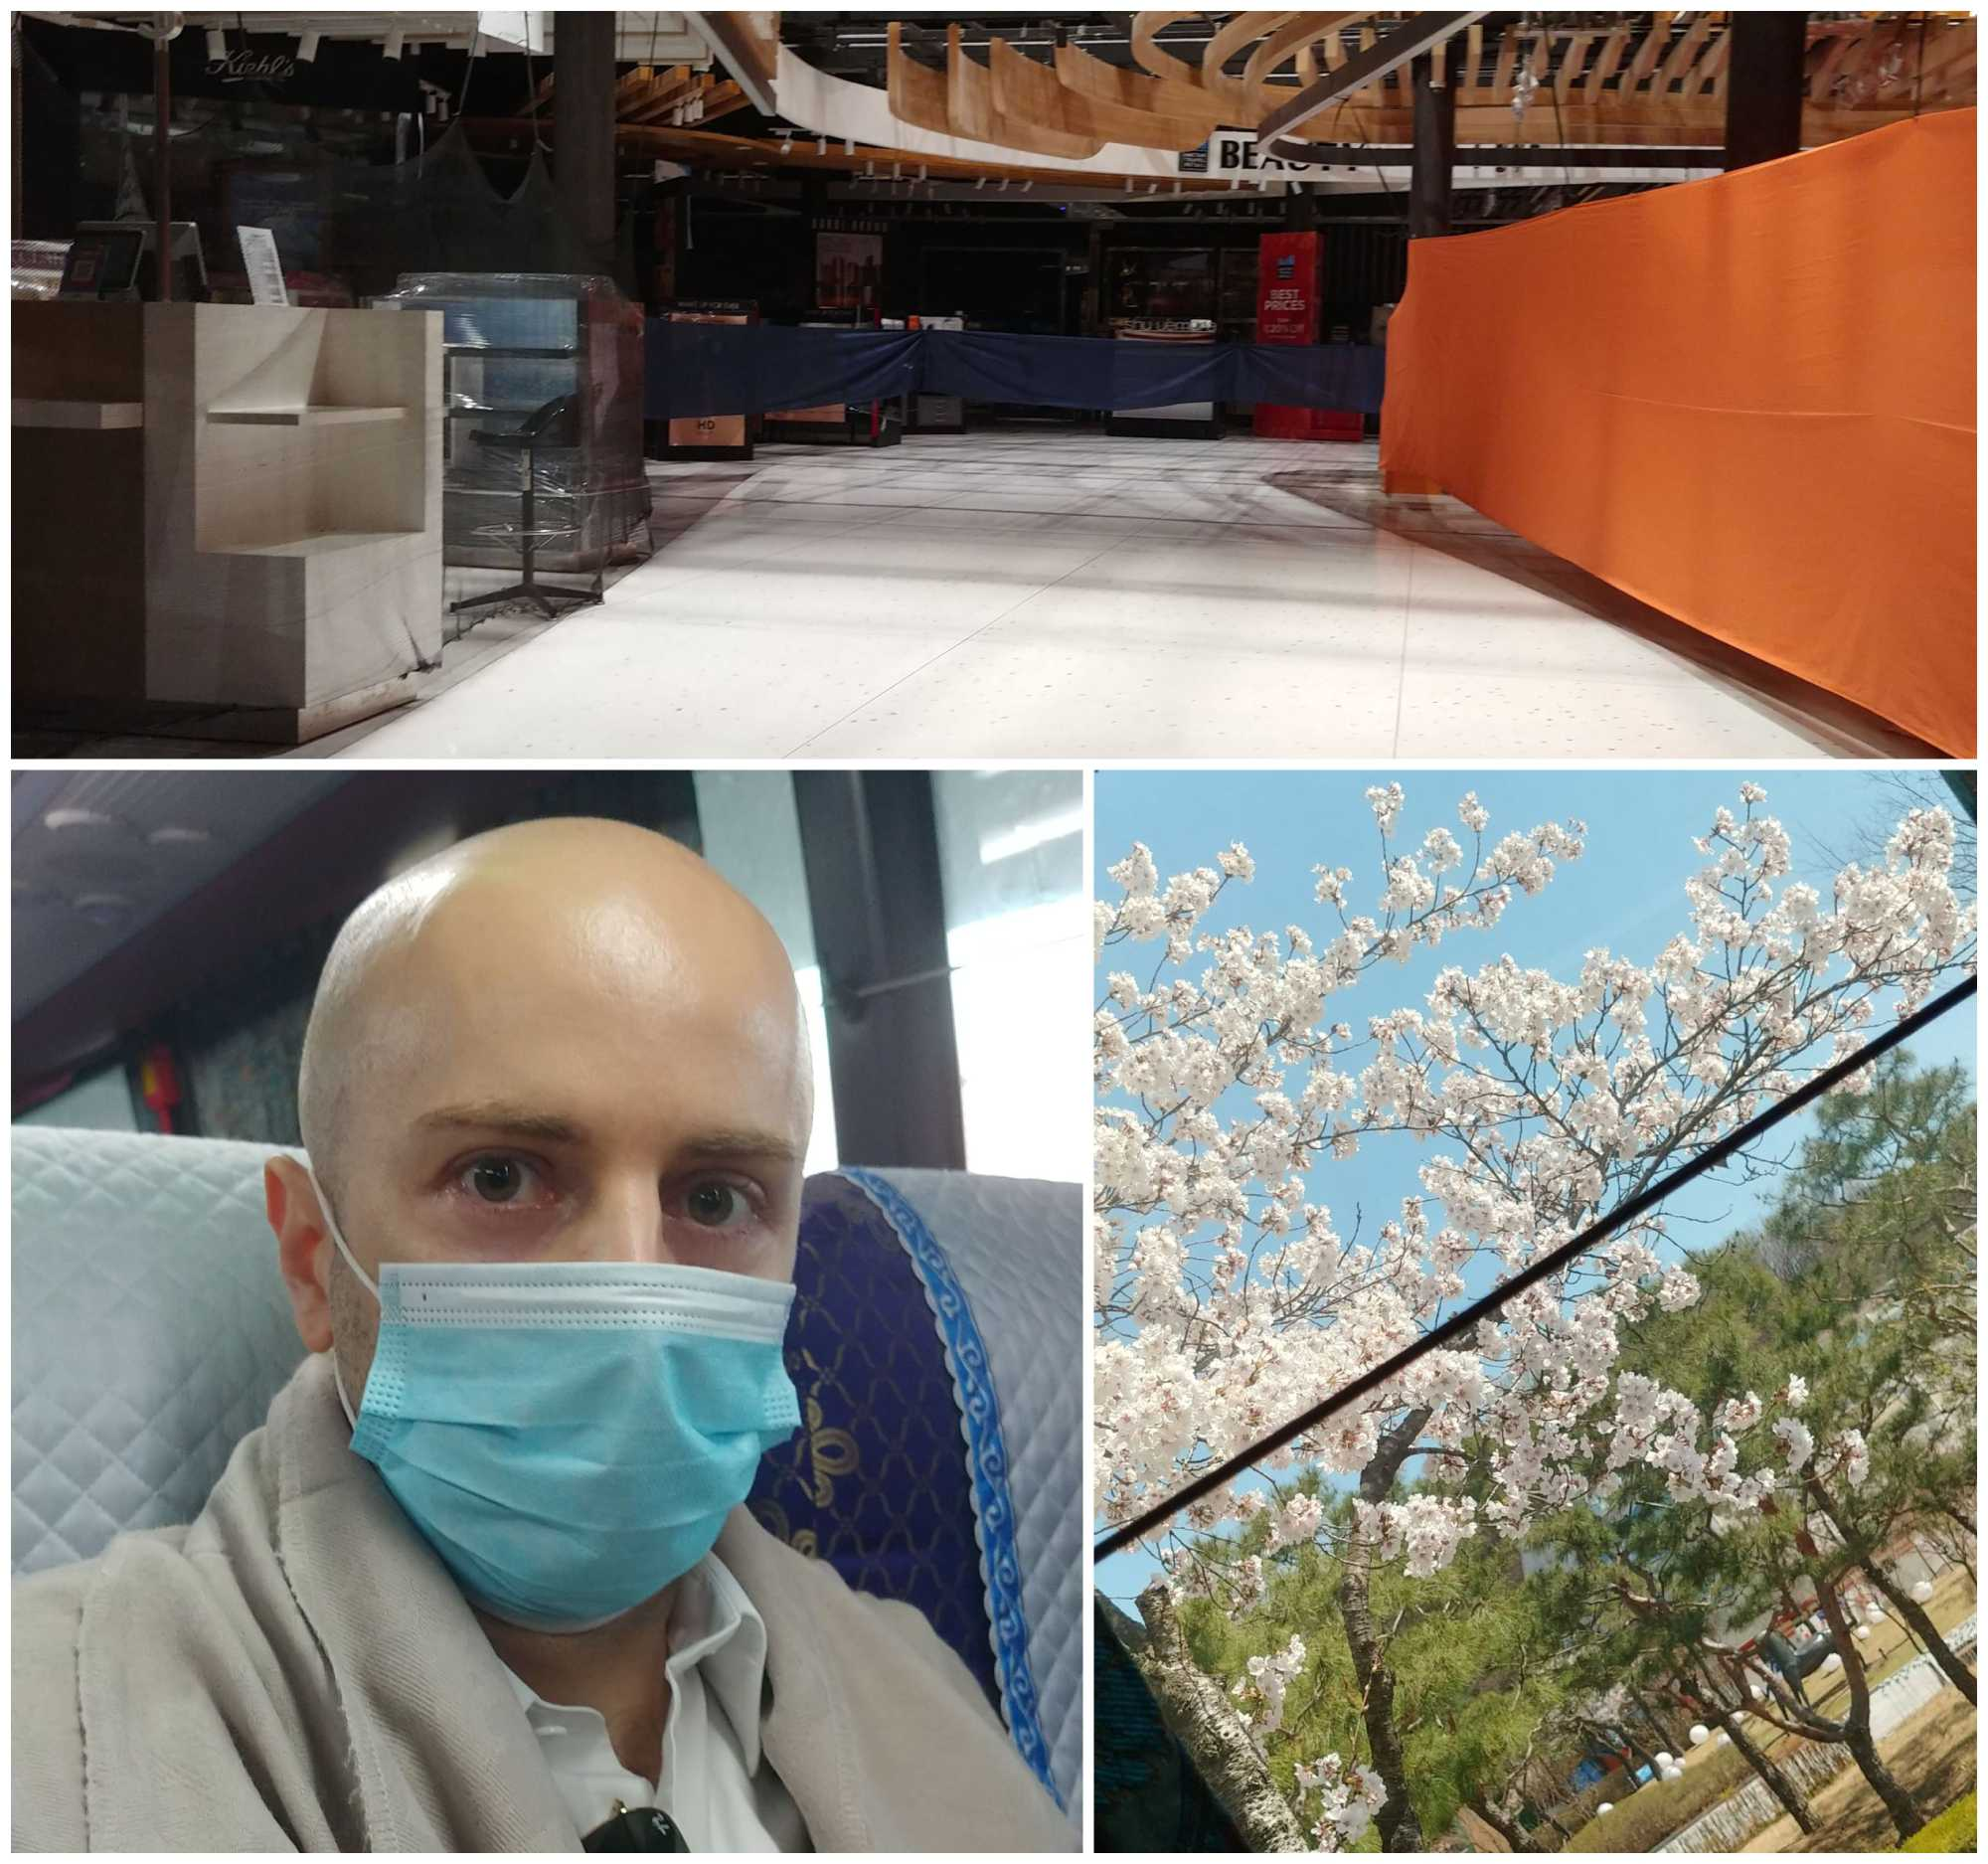 Lucio trip to korea during coronavirus